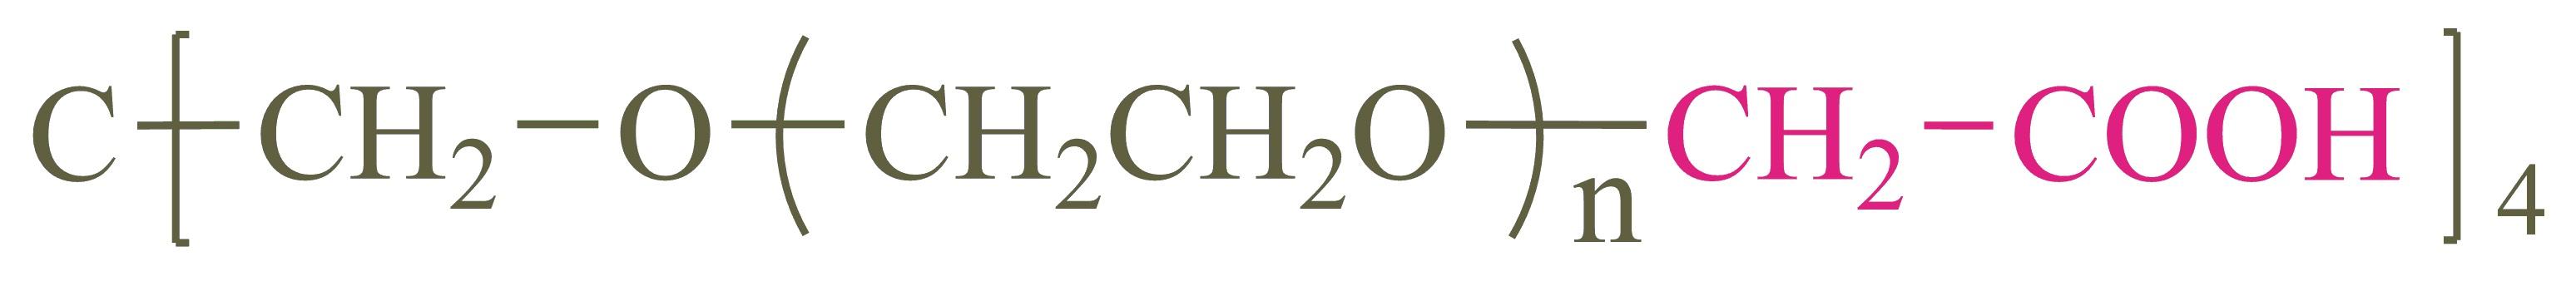 四臂聚乙二醇羧酸(4-arm PEG-CM);4-arm Poly(ethylene glycol) carboxylic acid